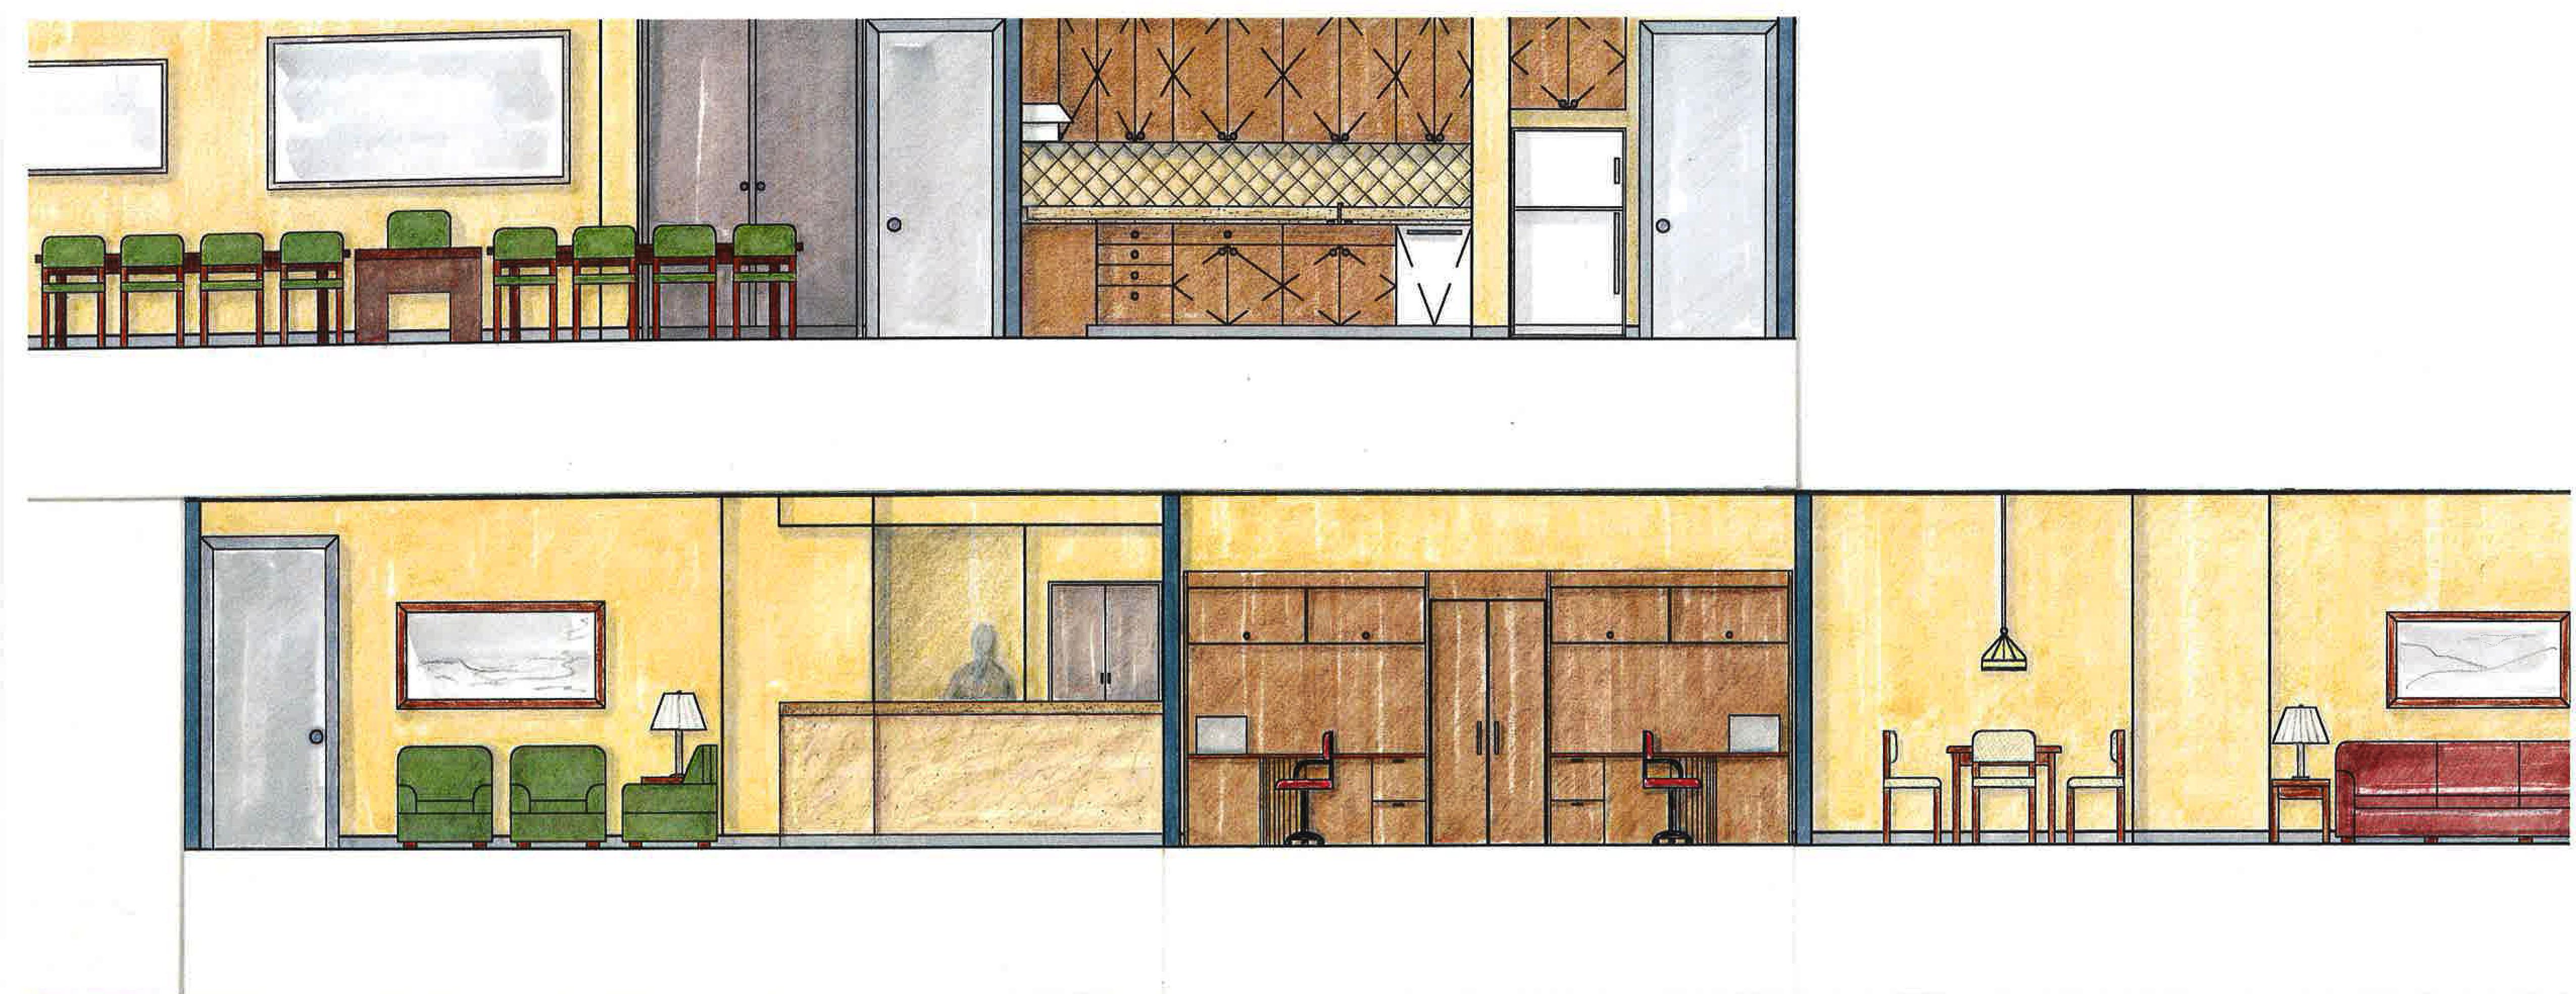 Hand Rendered Floor Plan By And Elevation Renderings Laurie Davis At Coroflot Com